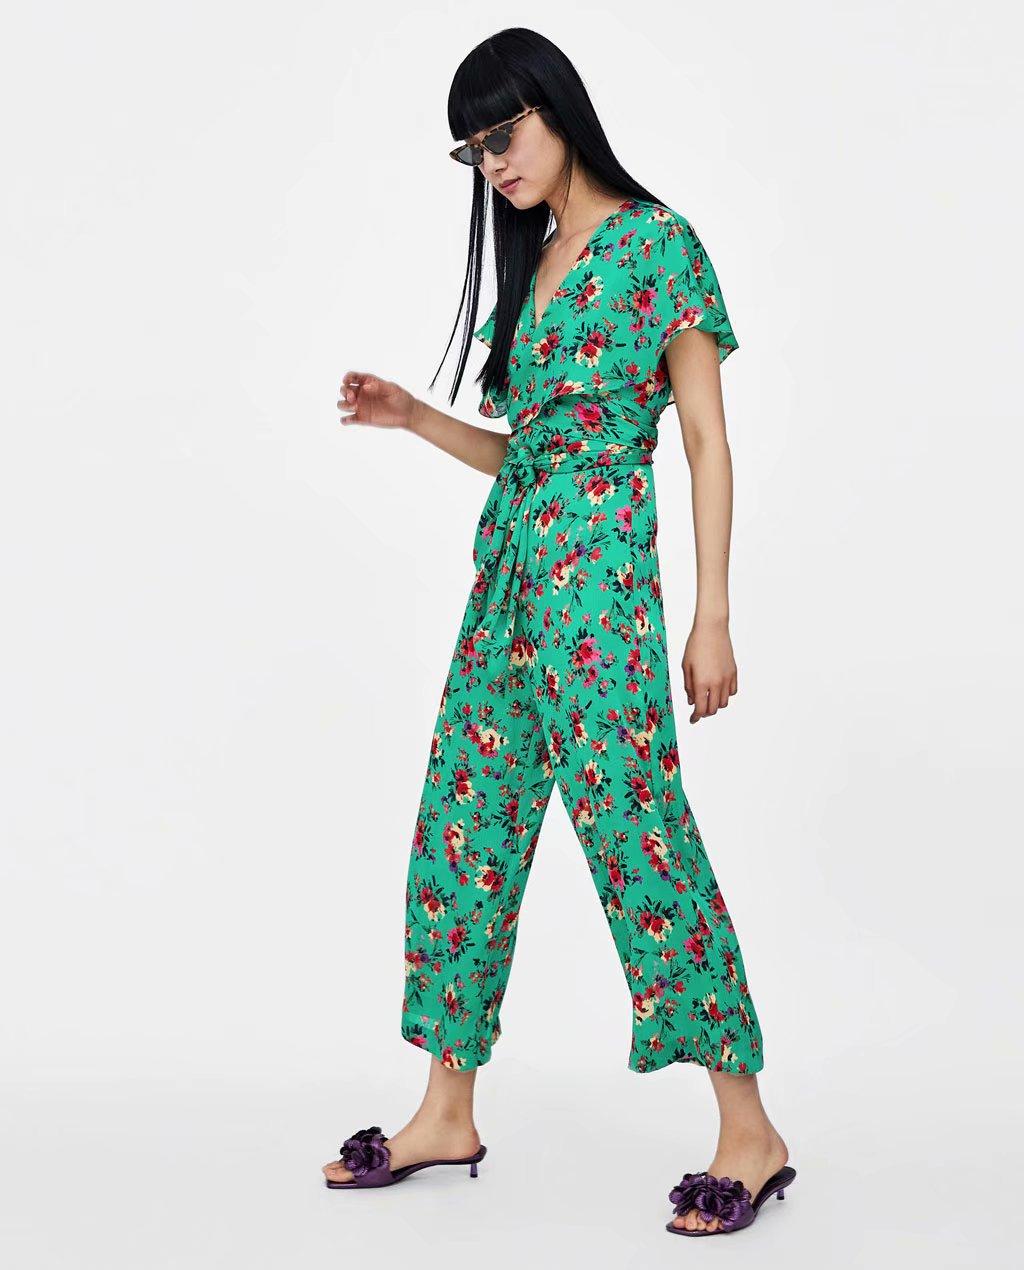 Cotton Fashionpants(Green-S) NHAM4423-Green-S